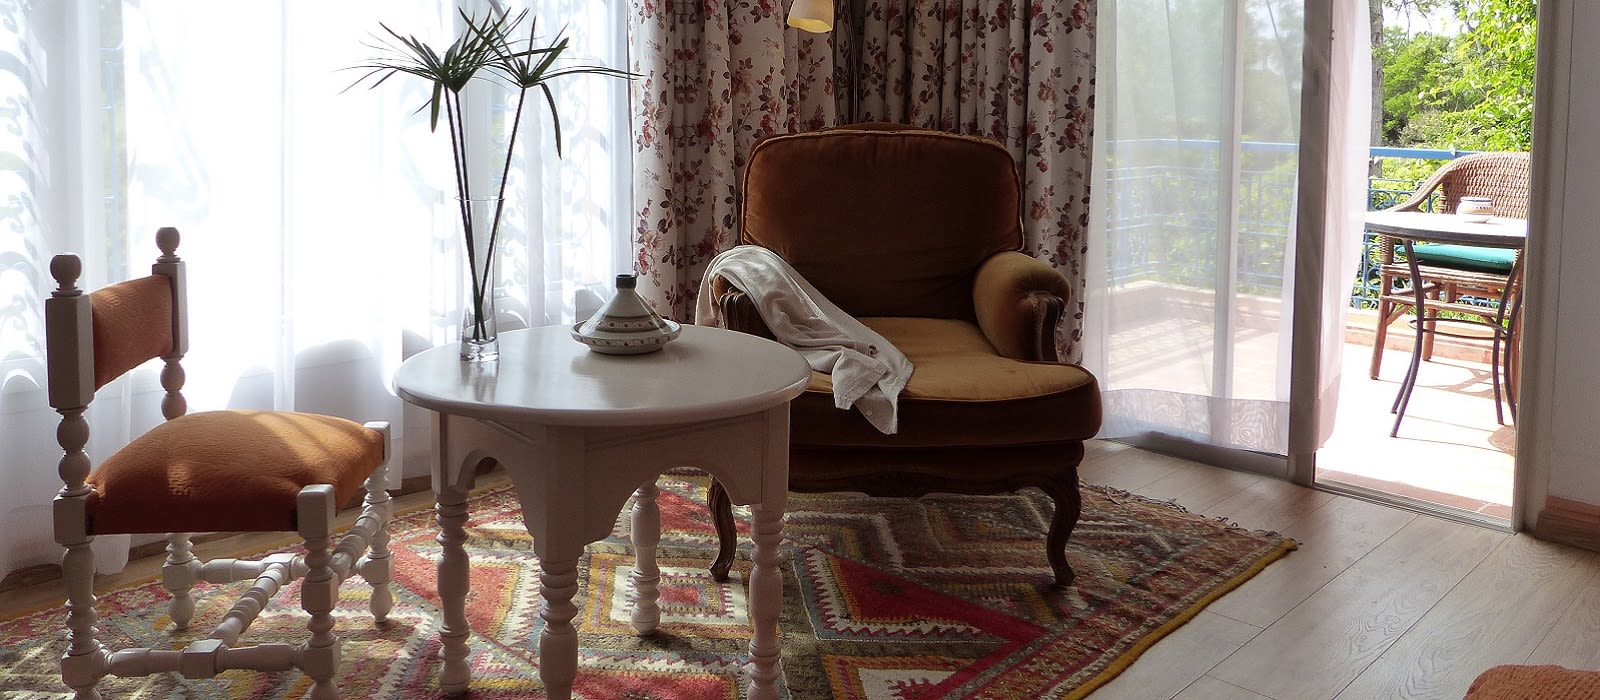 Hotel Villa Mandarine Morocco